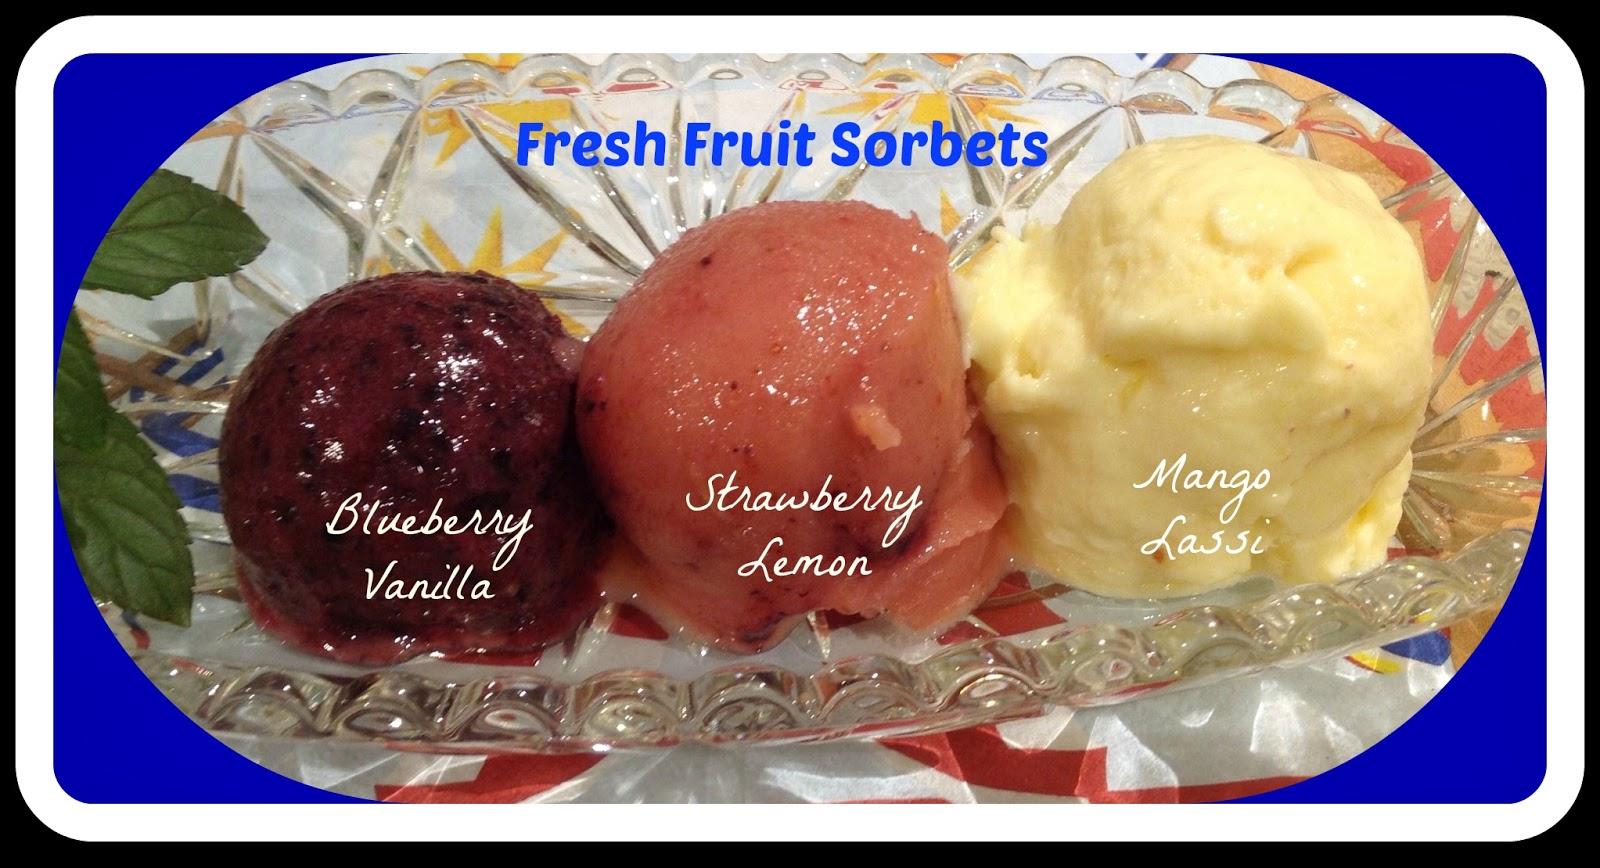 Three flavors of sorbet